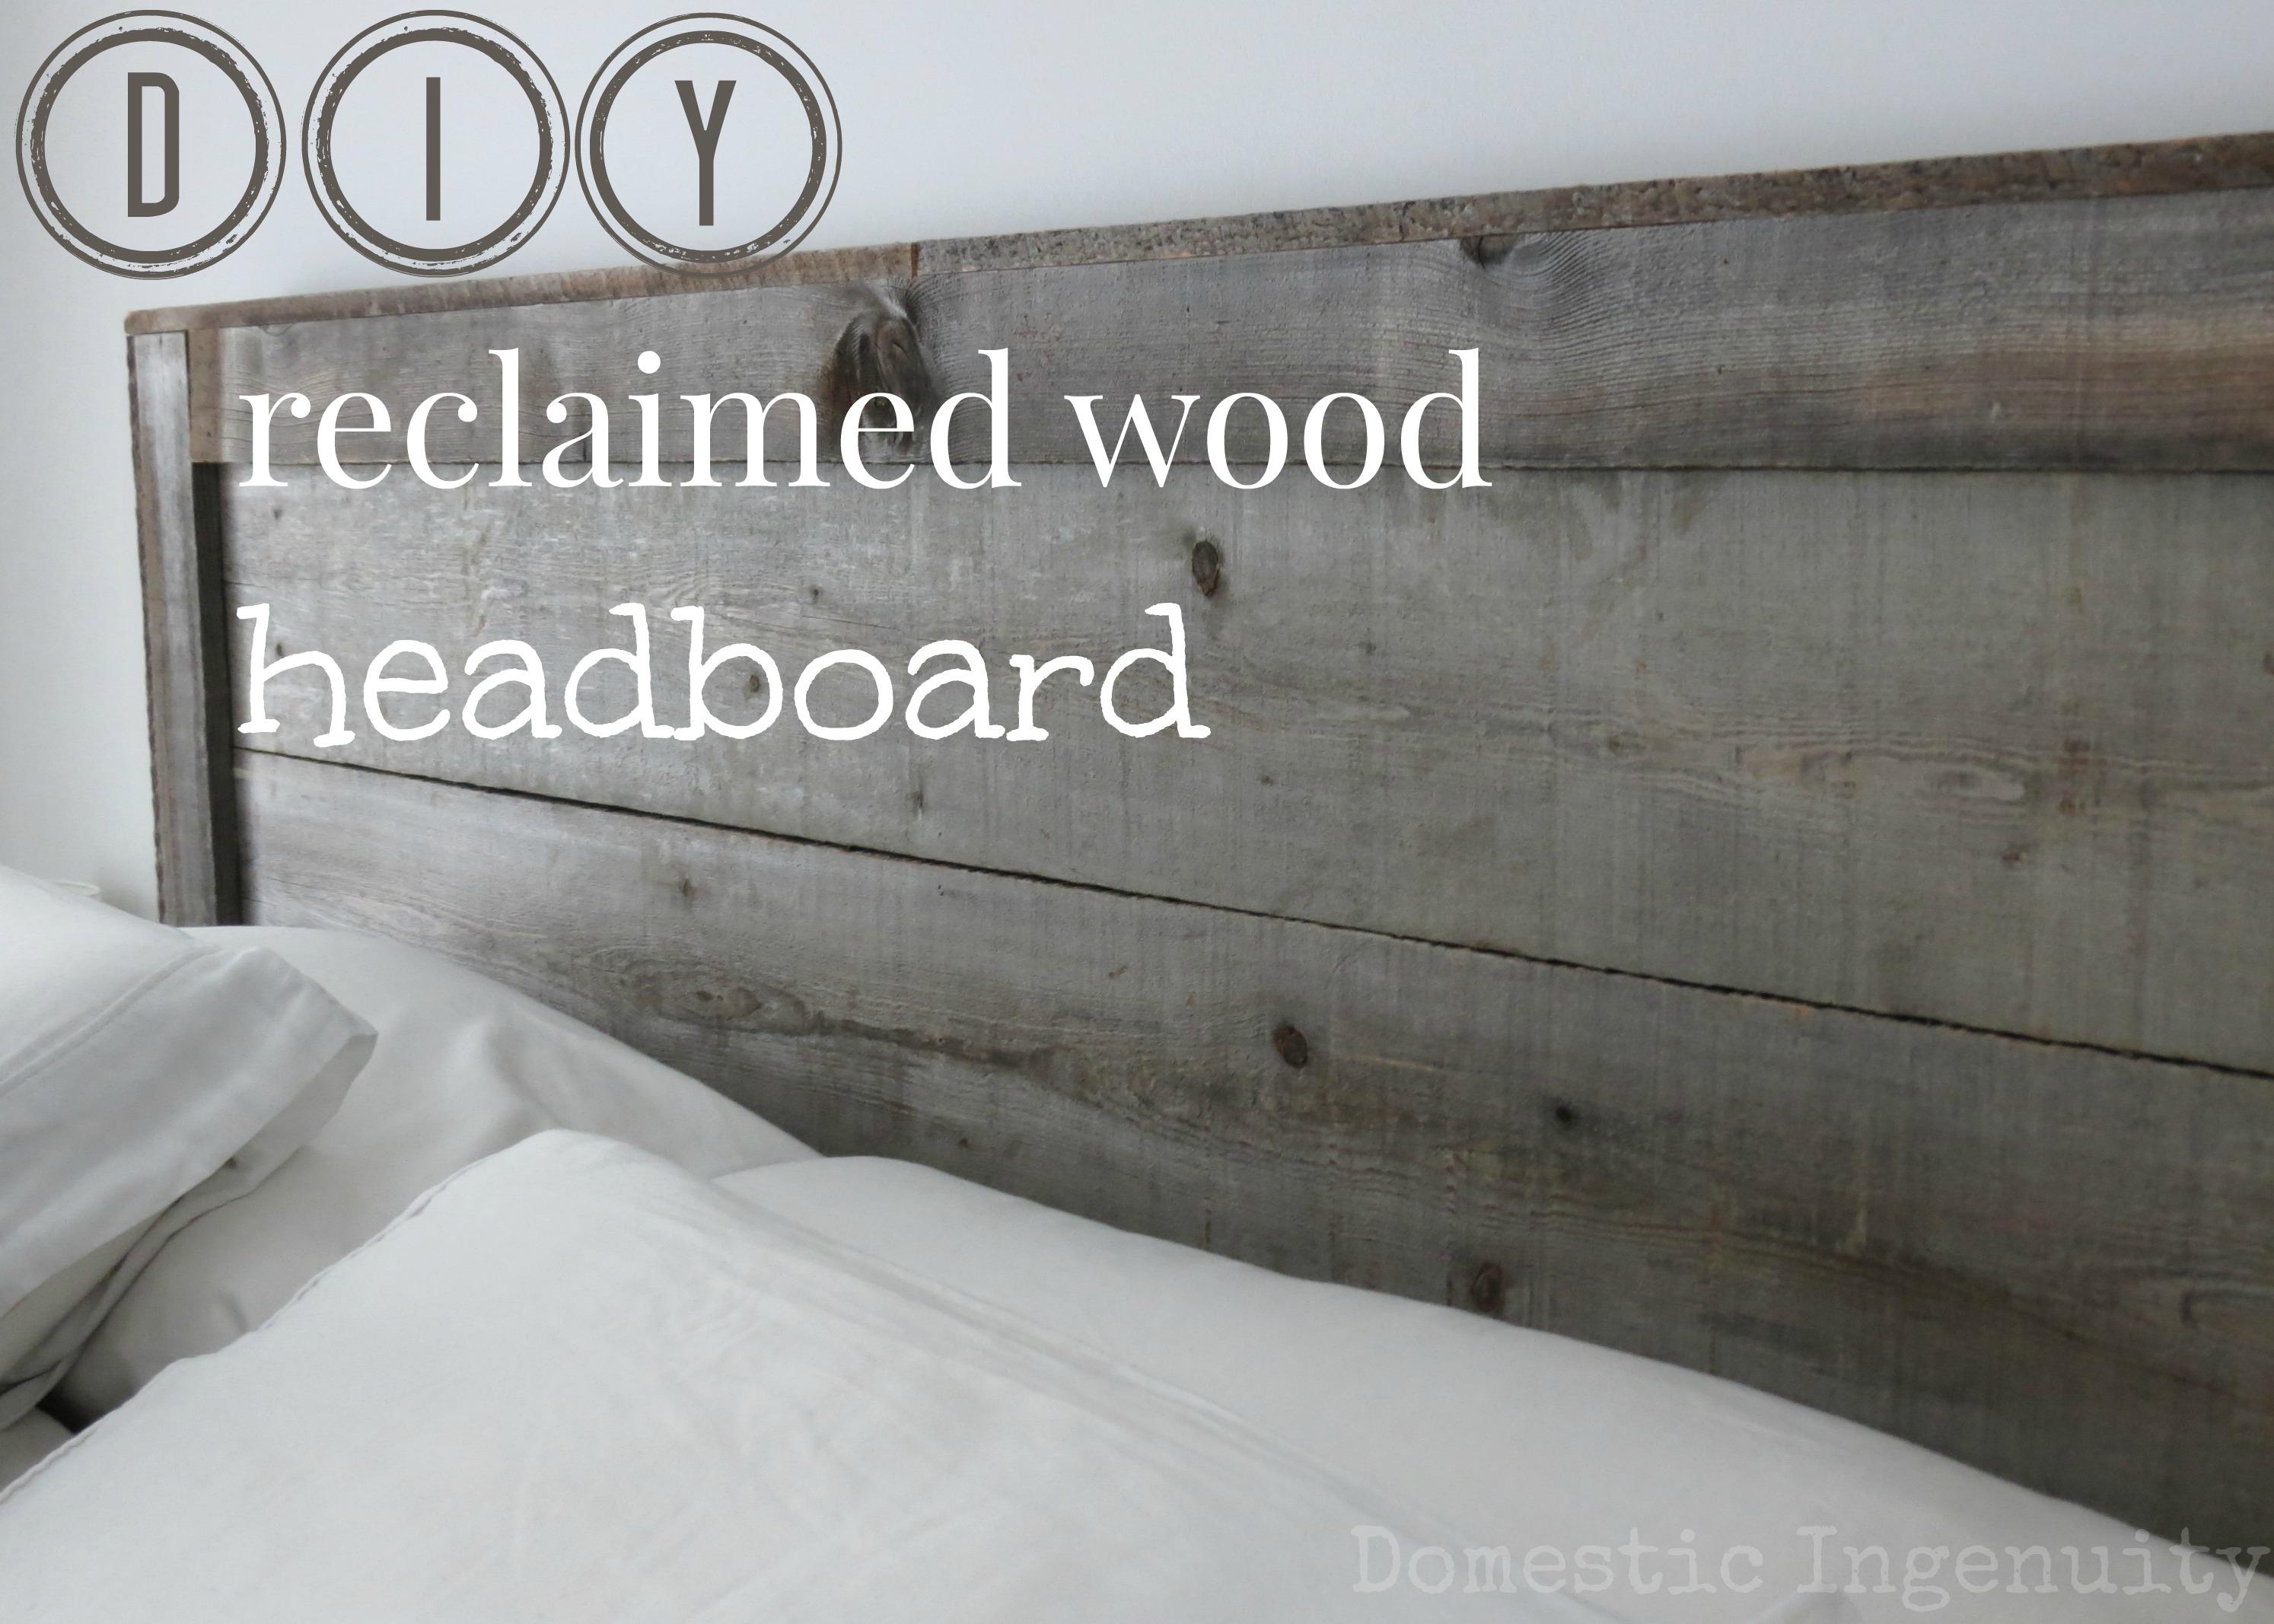 walnut headboard dark century platform modern tufted upholstery frame mid bedroom bed grey wood material wonderful design fabric padded